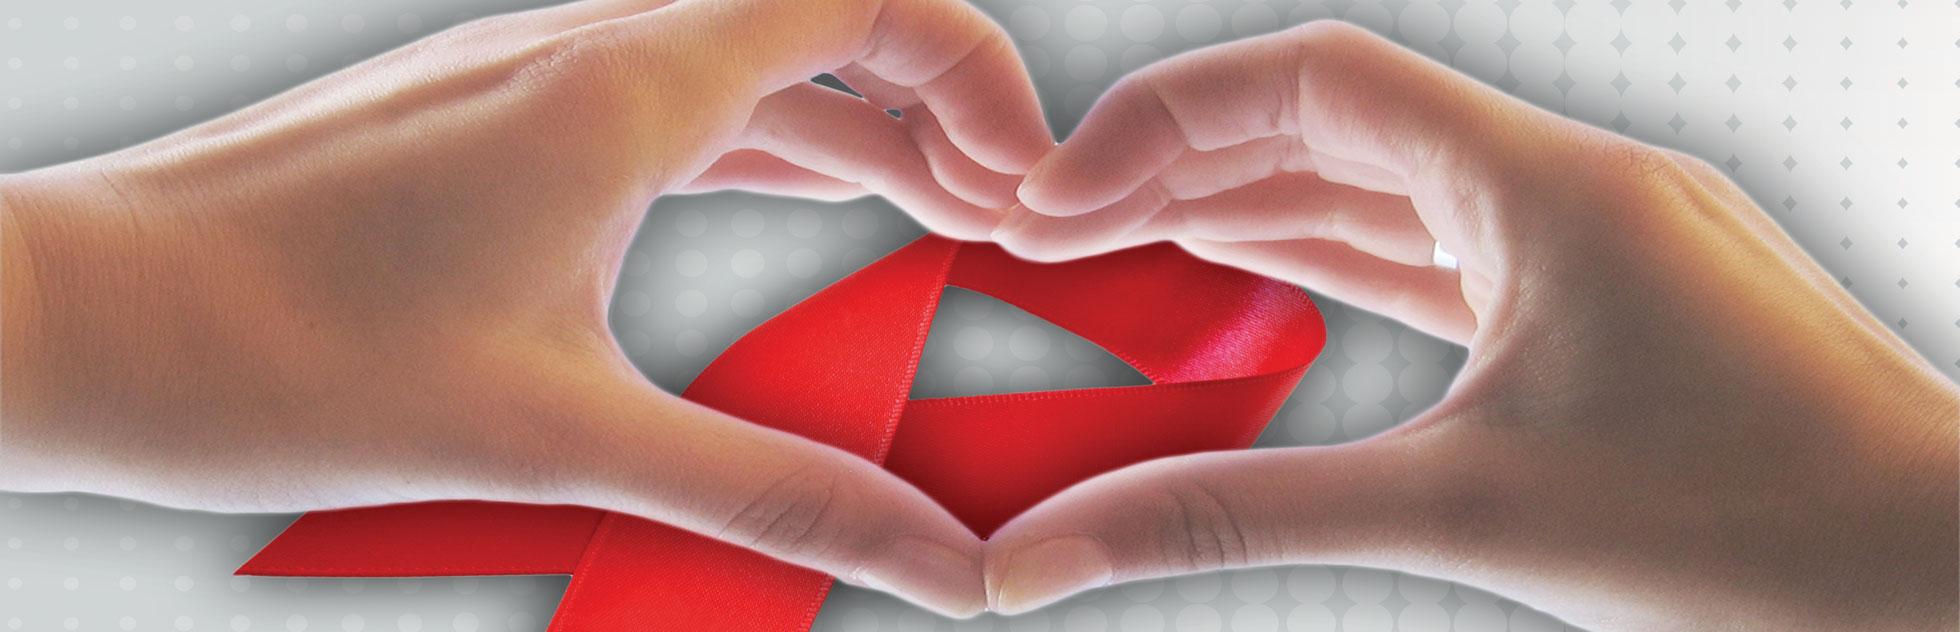 Evropska nedelja testiranja na HIV/AIDS